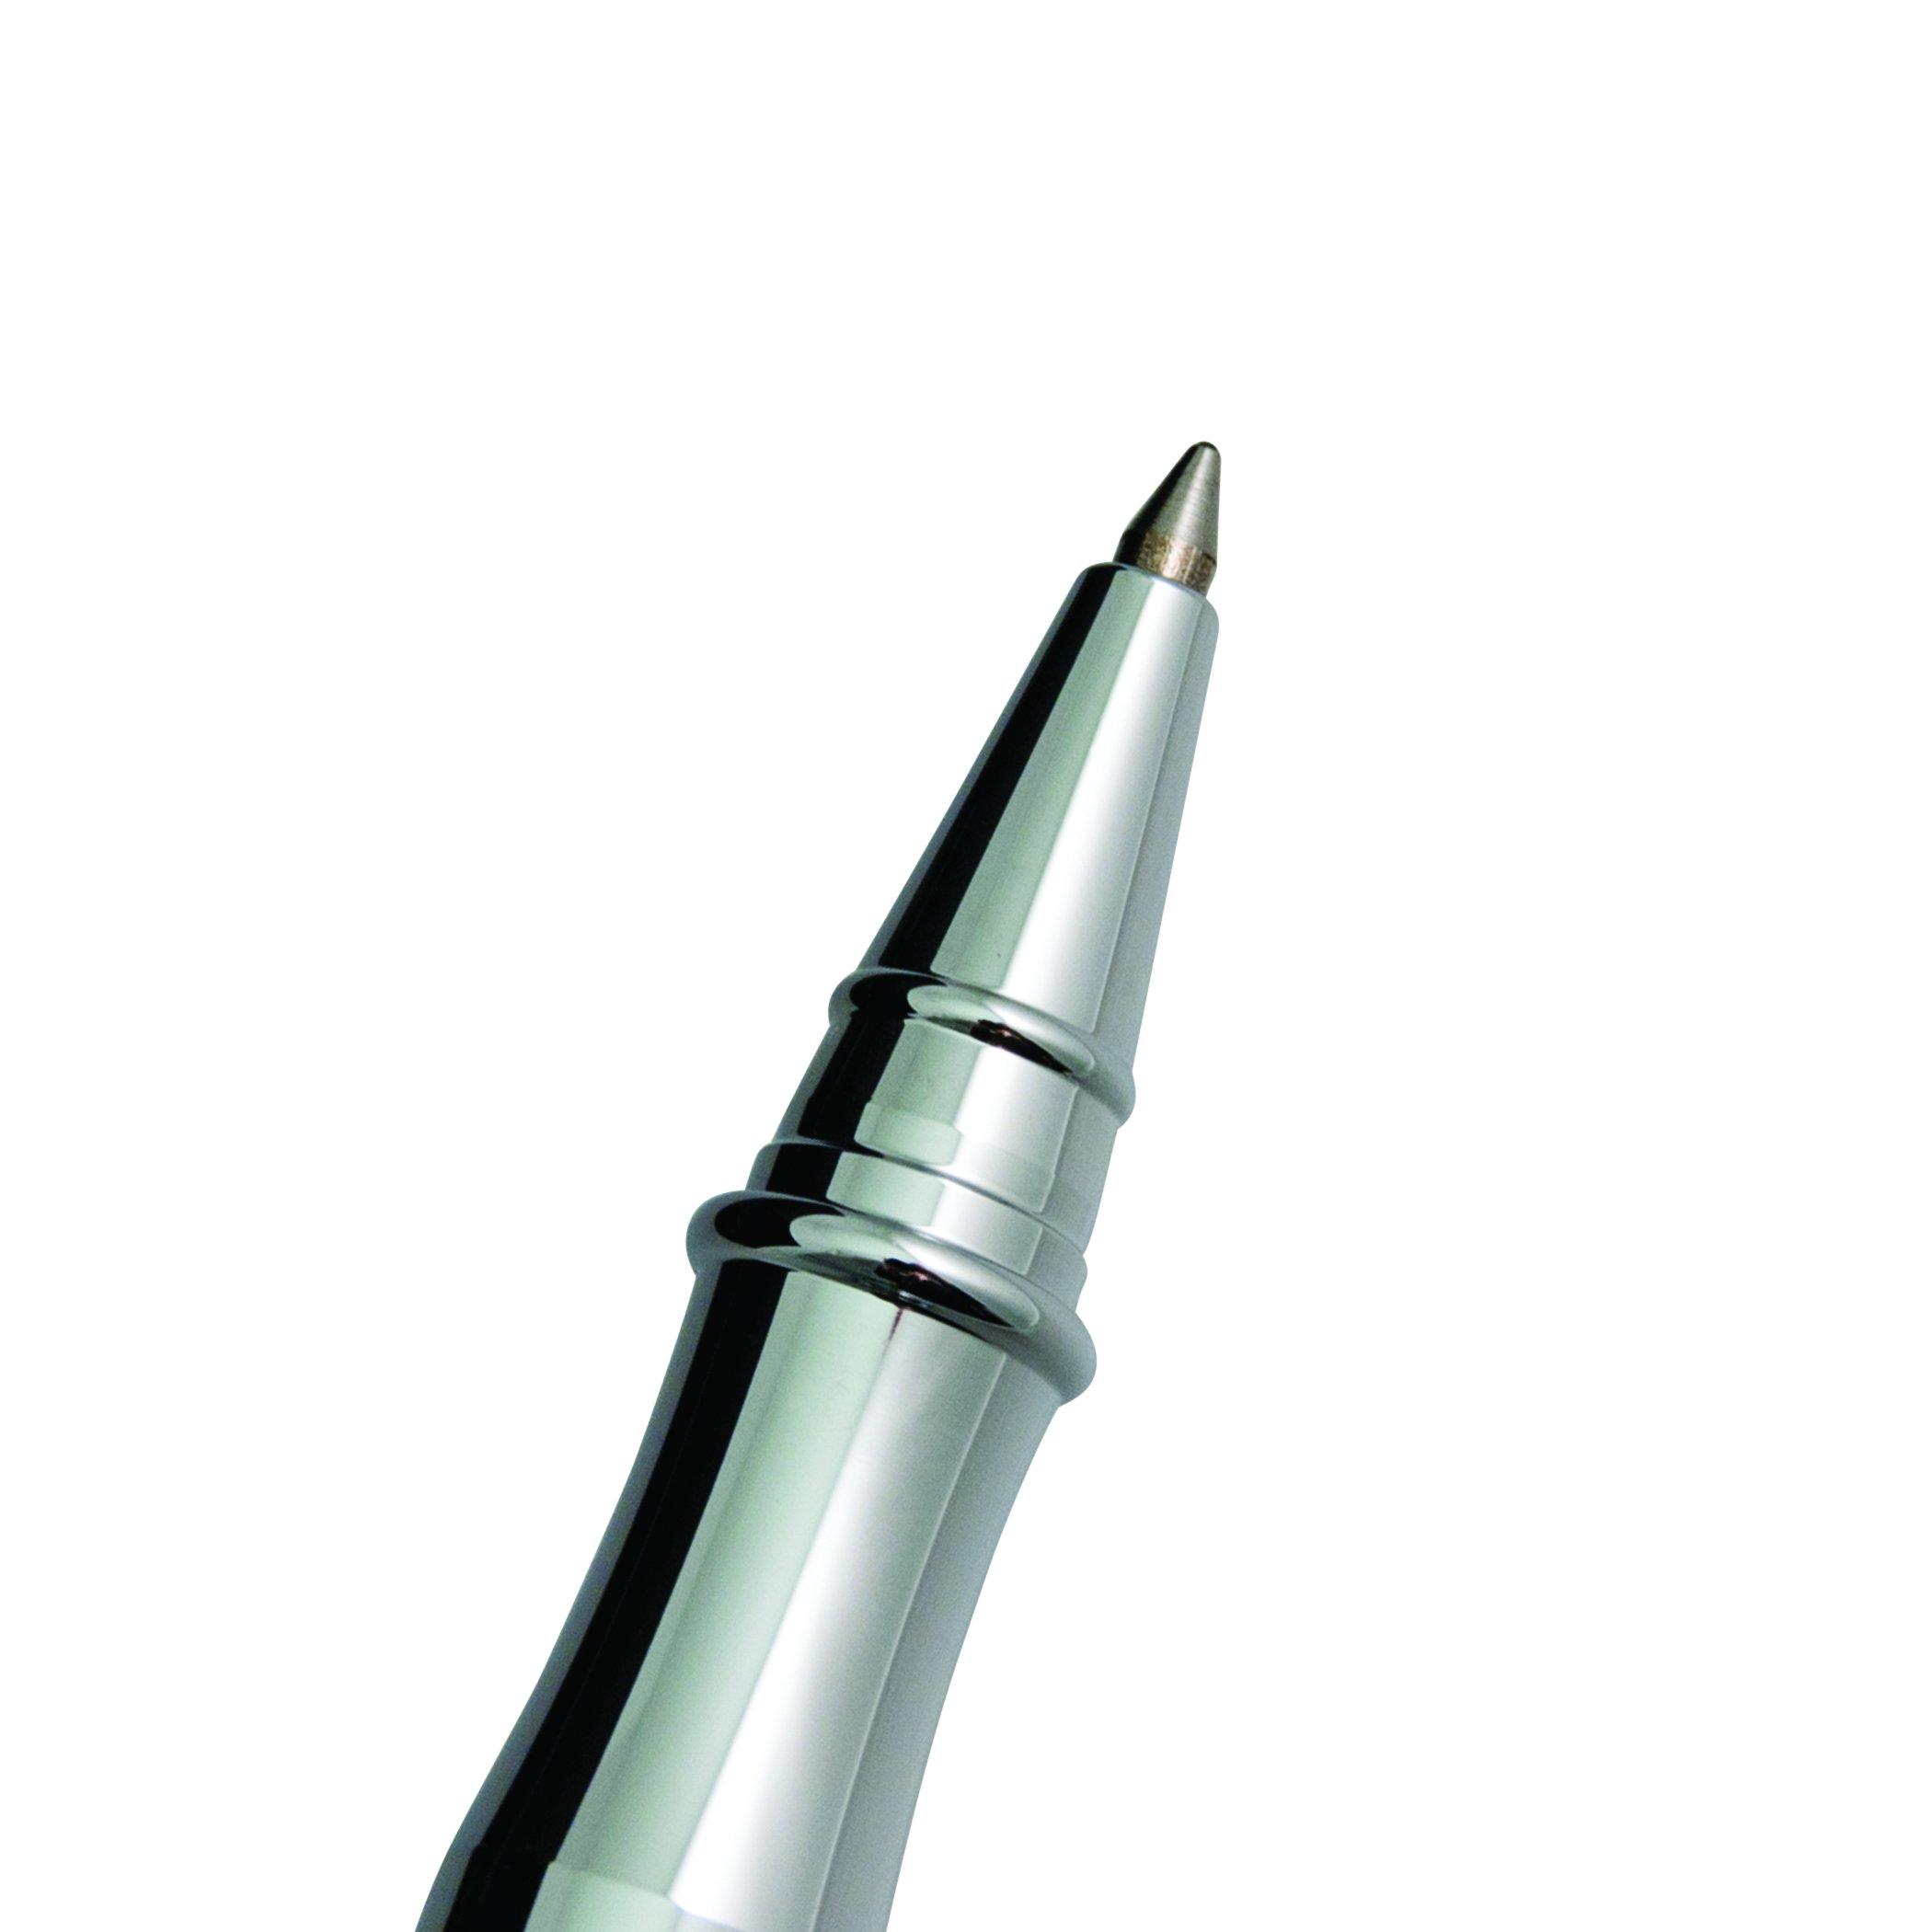 Monteverde Invincia Rollerball Pen, Chrome with Black Carbon Fiber (MV40064) by Monteverde (Image #2)